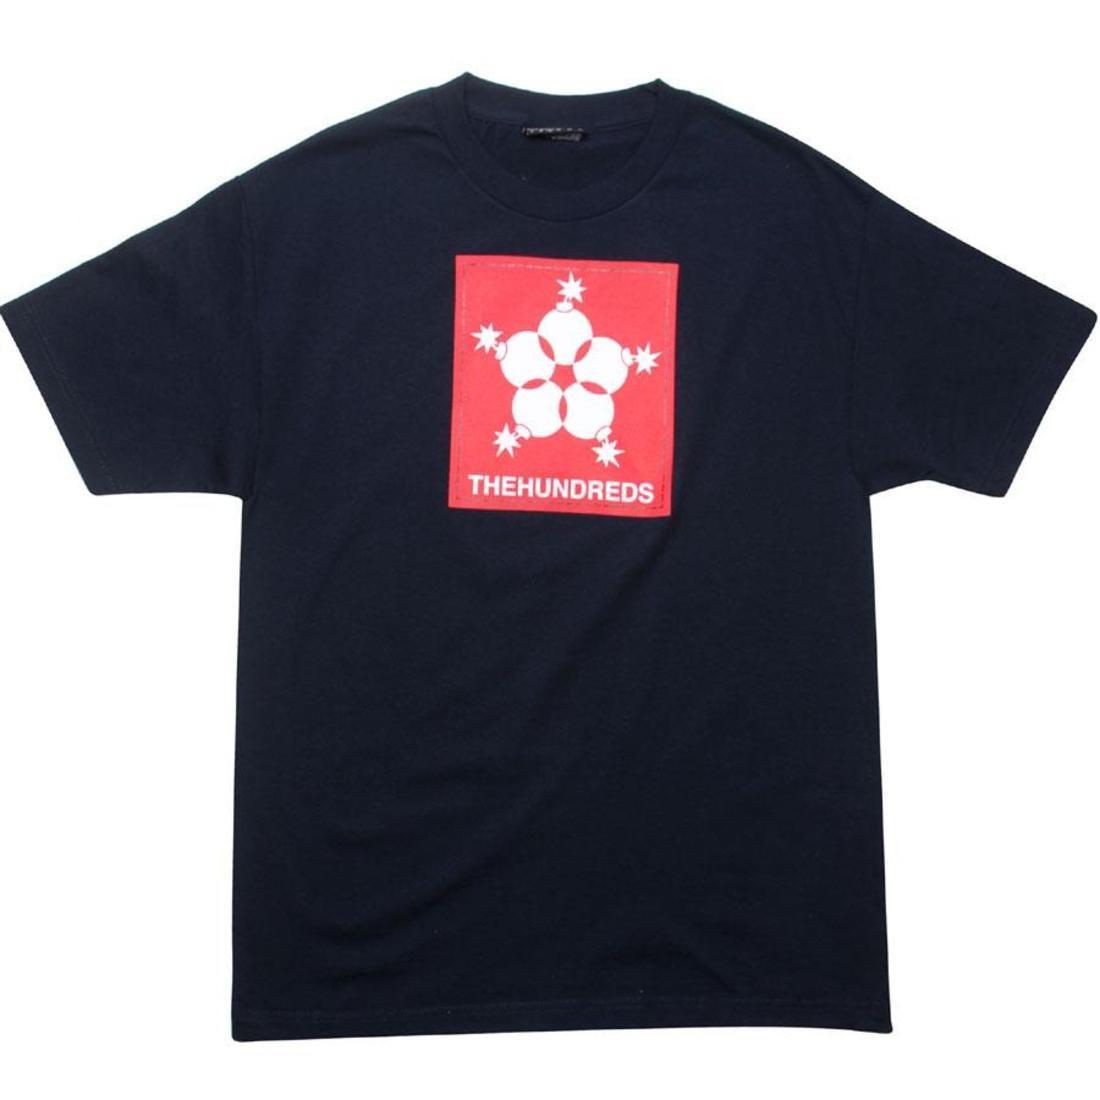 Tシャツ 紺 ネイビー 【 NAVY THE HUNDREDS LINER TEE 】 メンズファッション トップス Tシャツ カットソー